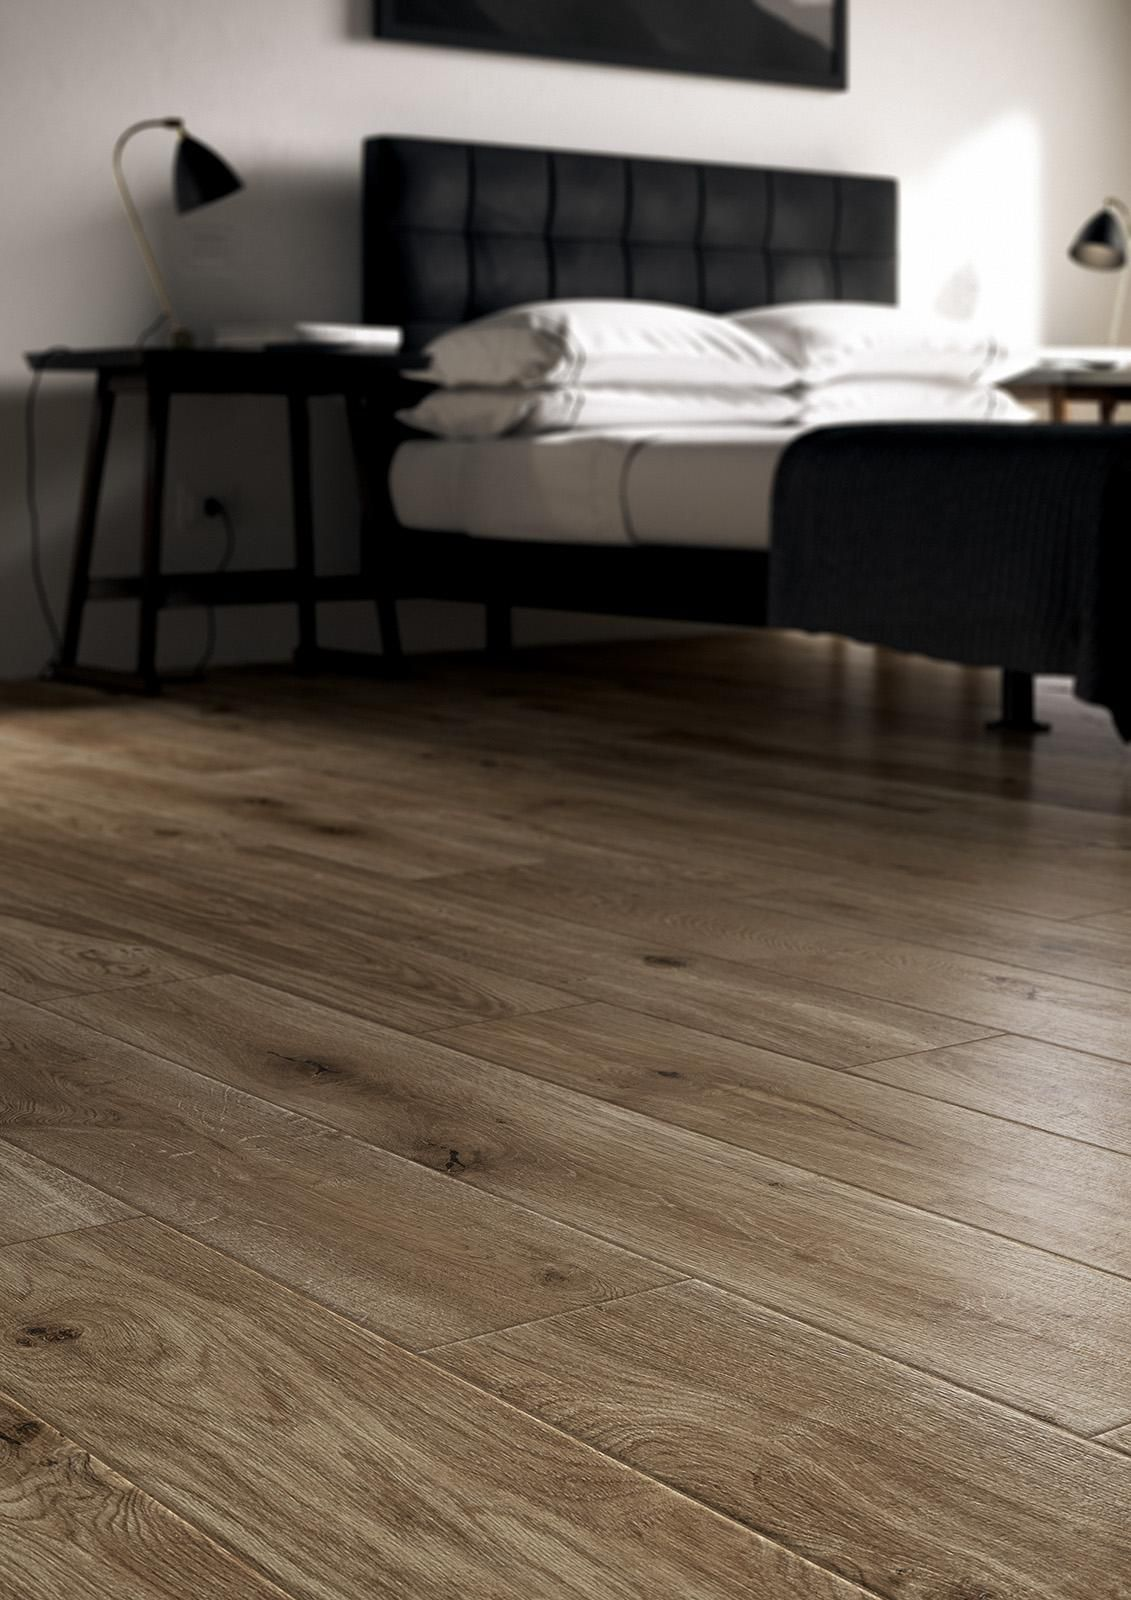 Treverkever - Wood Effect - Bedroom  Bedroom flooring, Tile